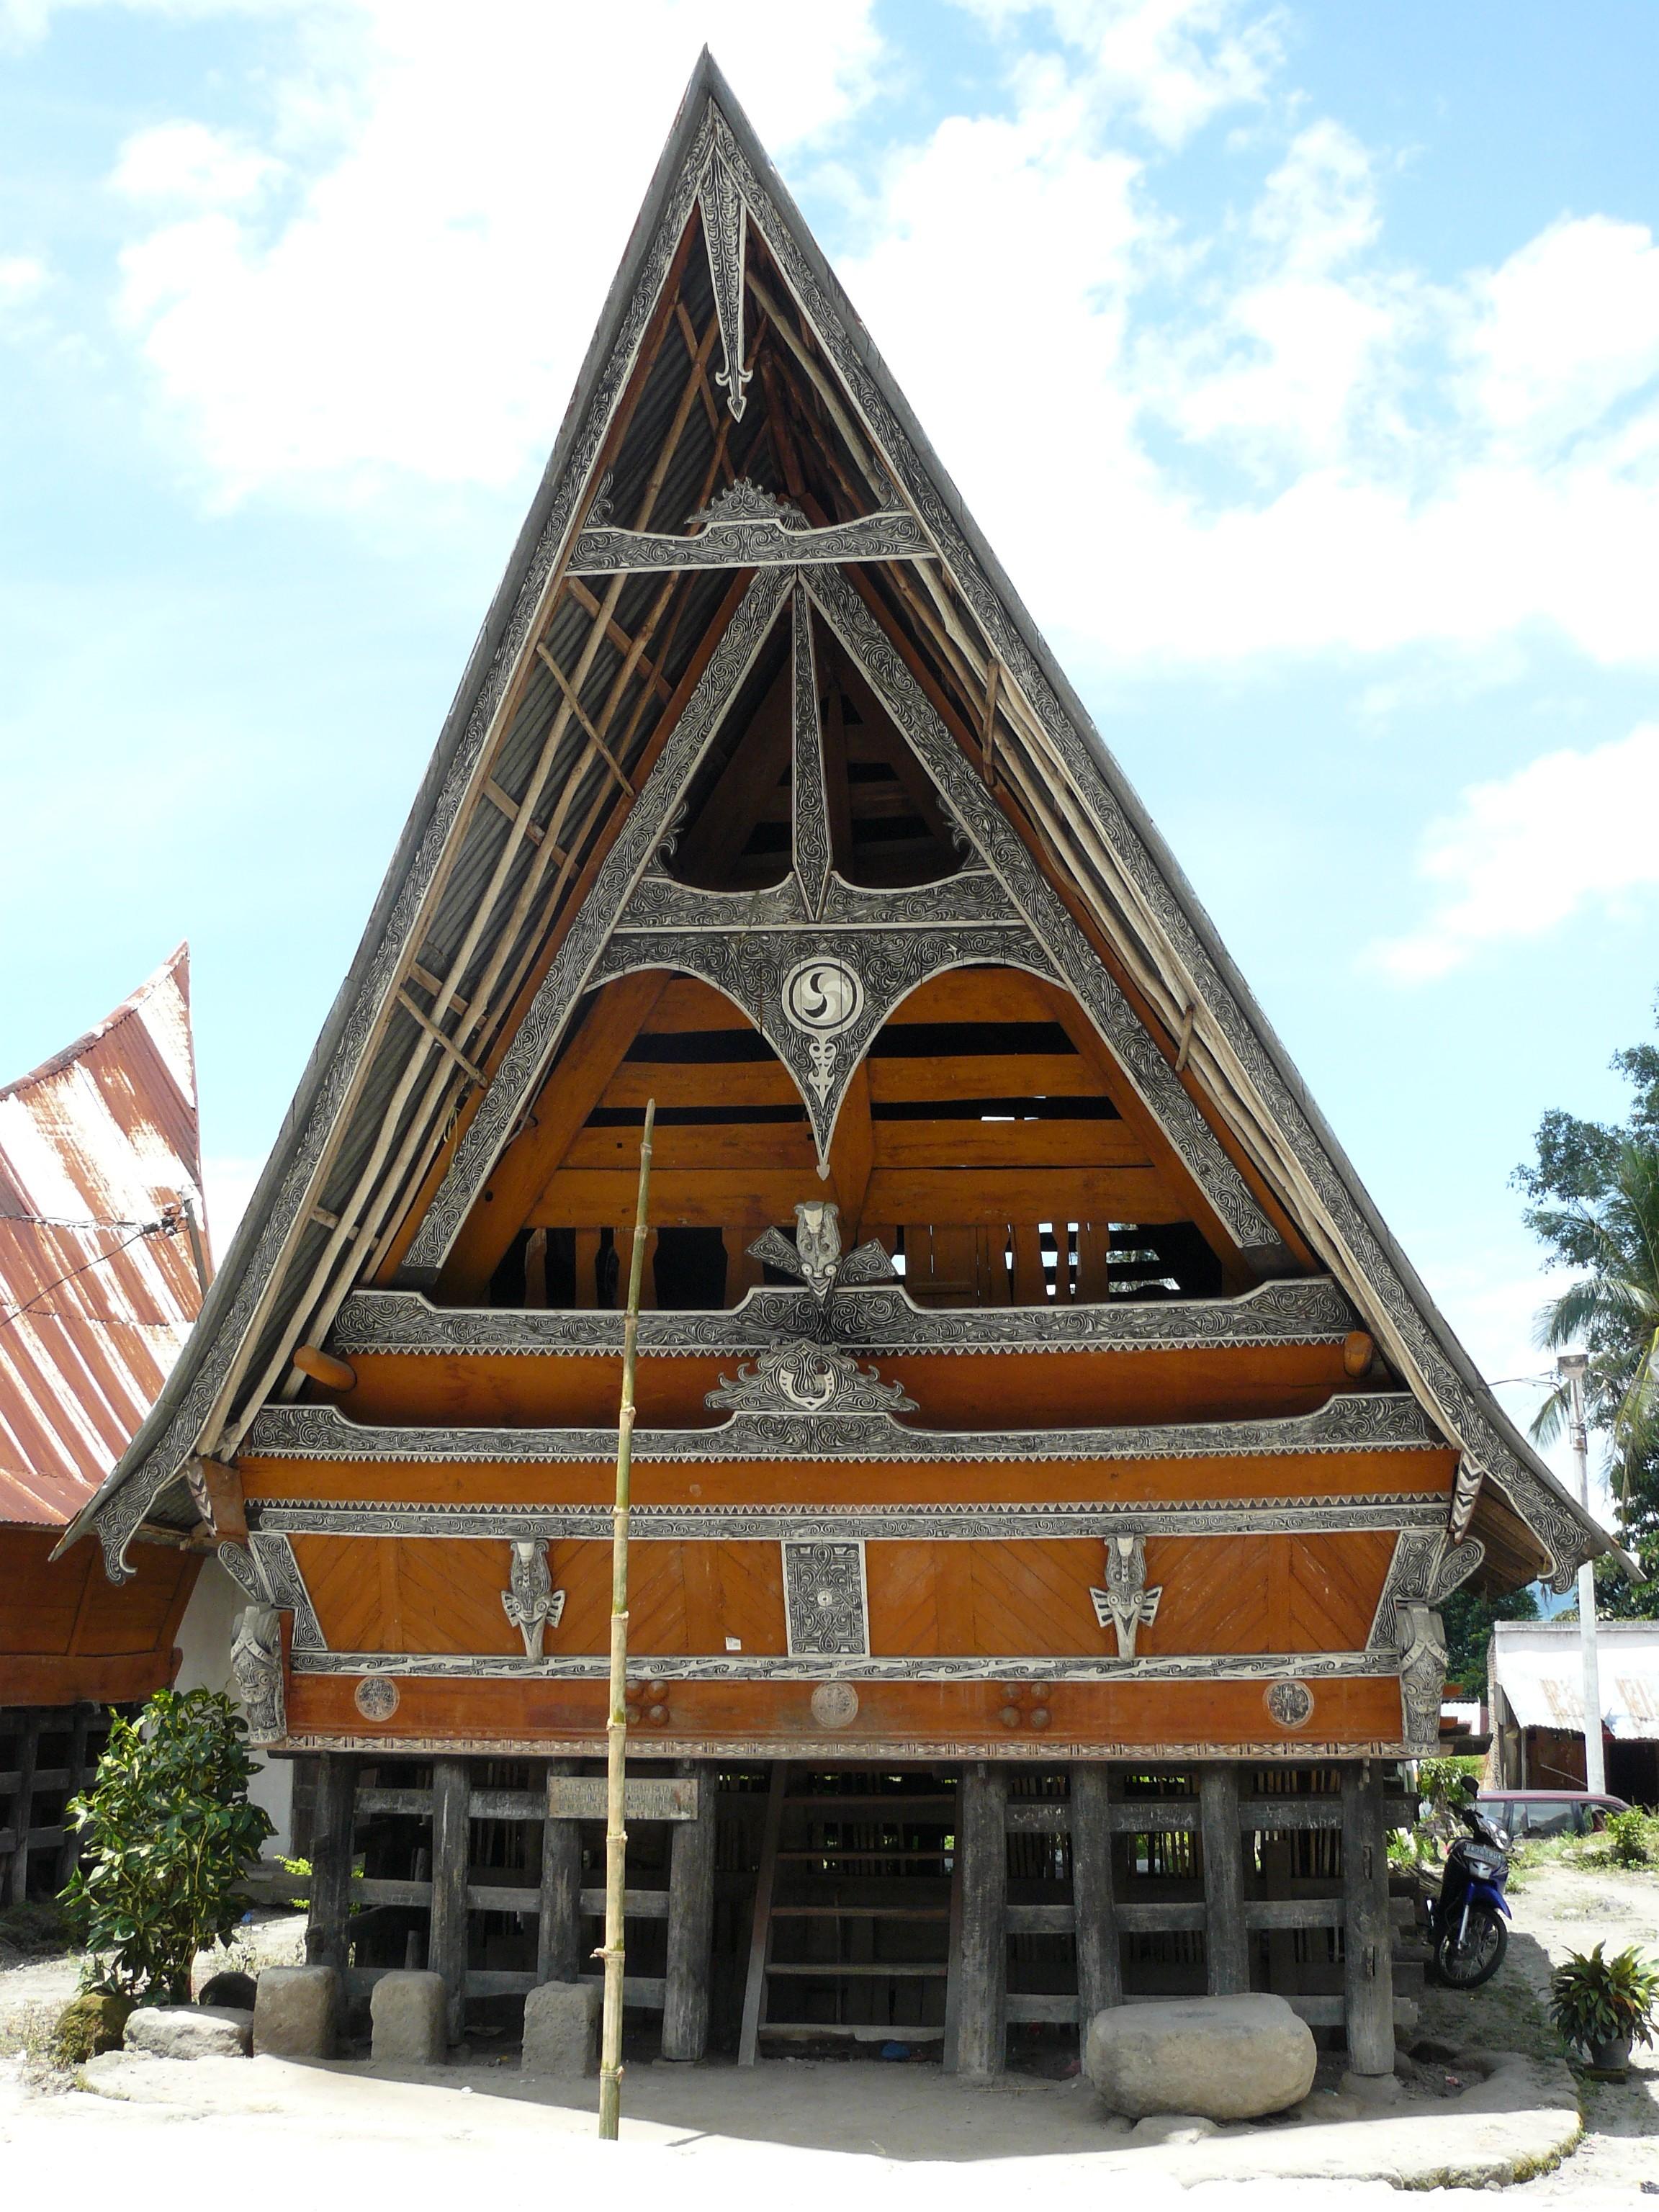 Rumah Adat Batak - Bolon, Simalungun, Karo, Pakpak + Gambar...